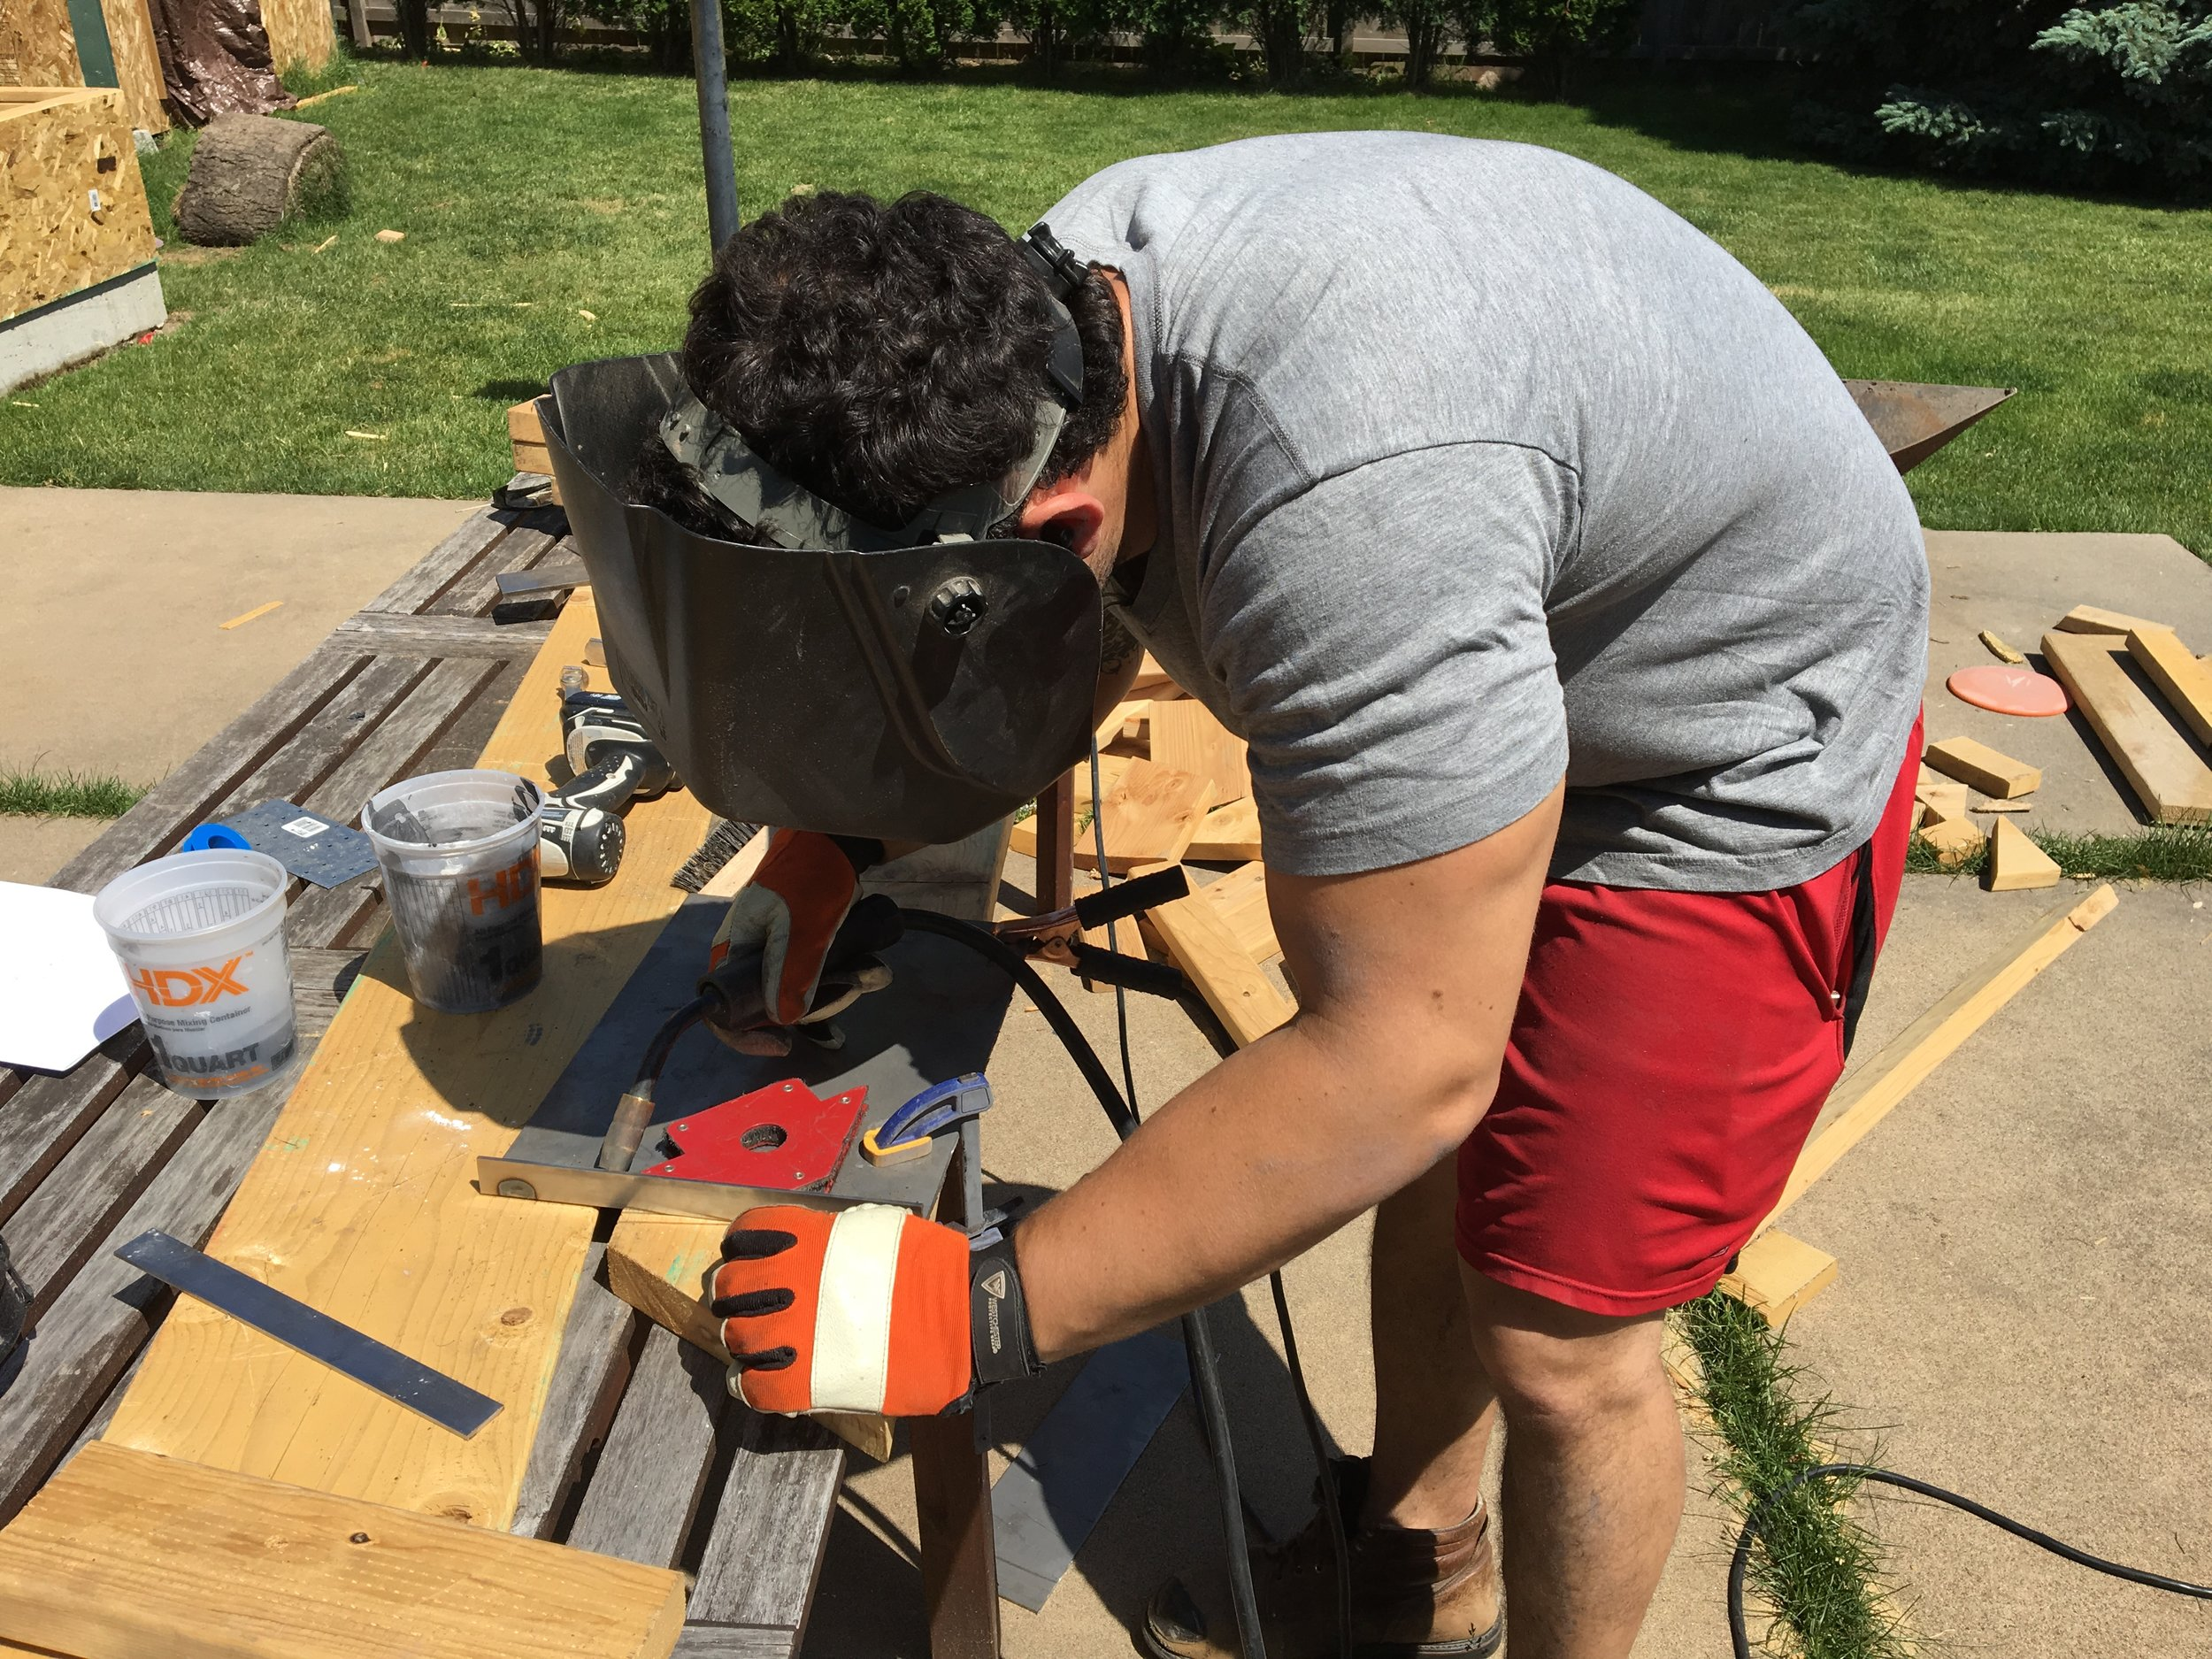 Welding on my welding bench / patio table.